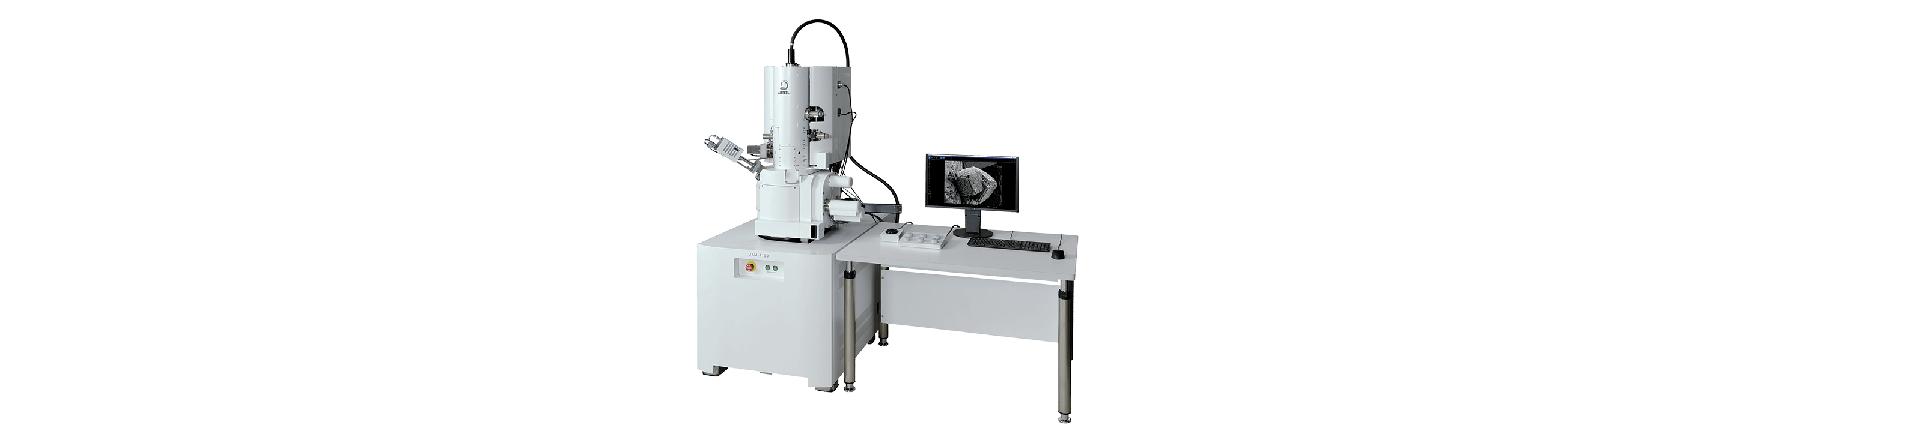 JEOL - Φασματομετρία NMR , JEOL - Ηλεκτρονική Μικροσκοπία Σάρωσης / Διέλευσης